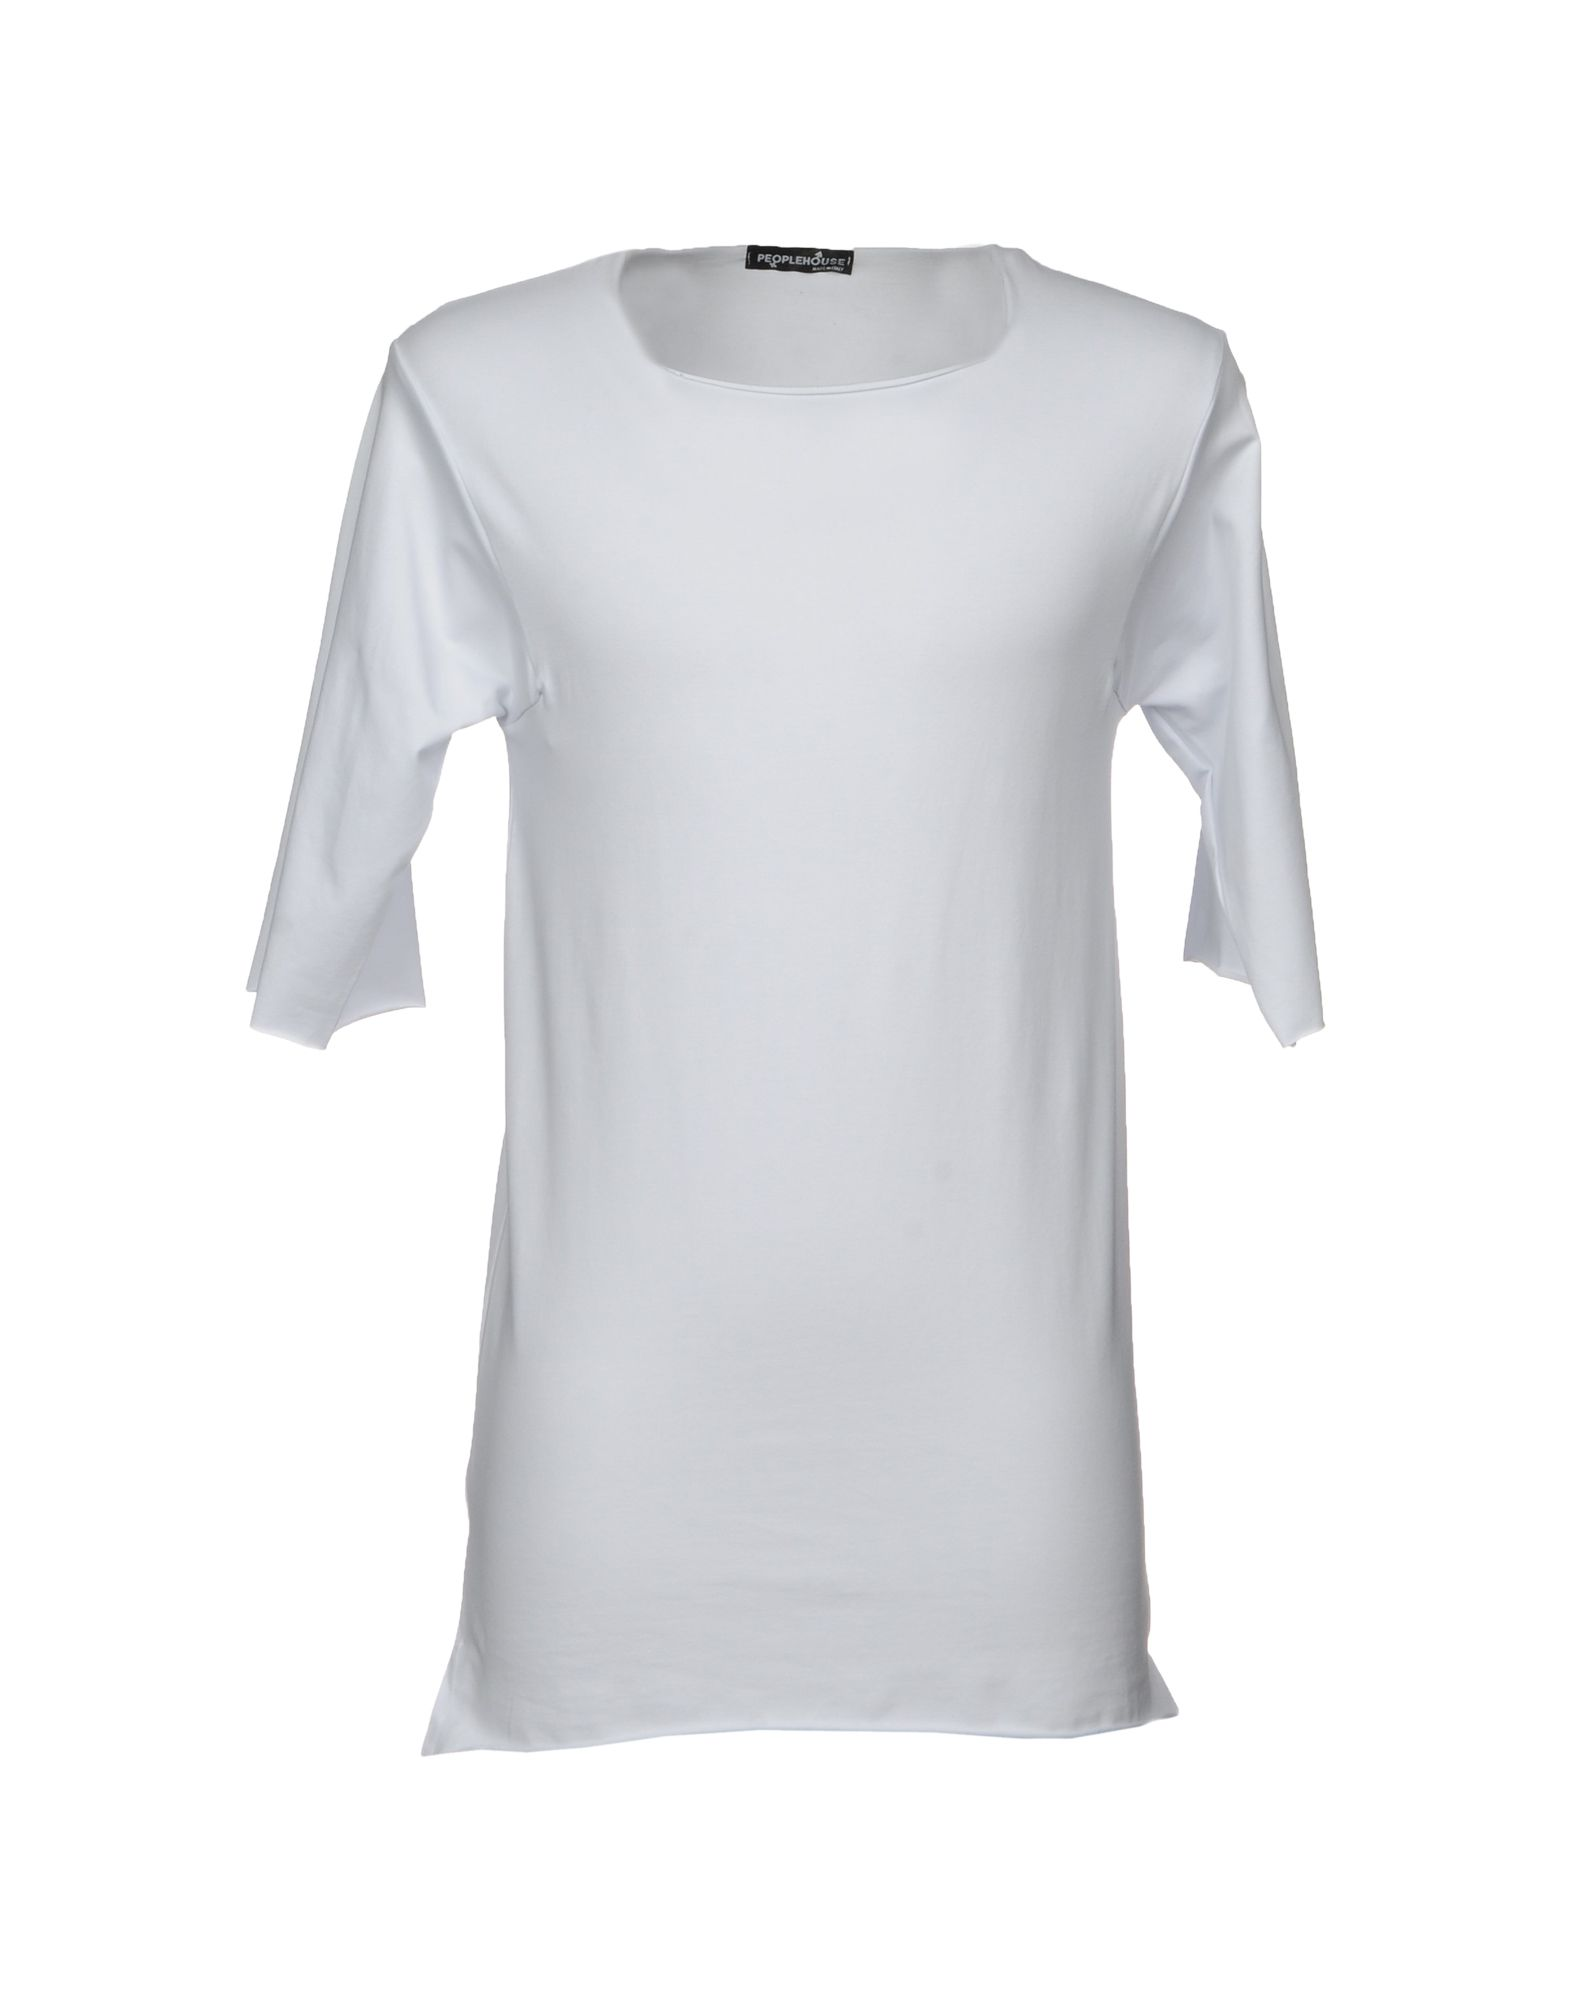 A A A buon mercato T-Shirt Peoplehouse Uomo - 12091264EV ef8b31